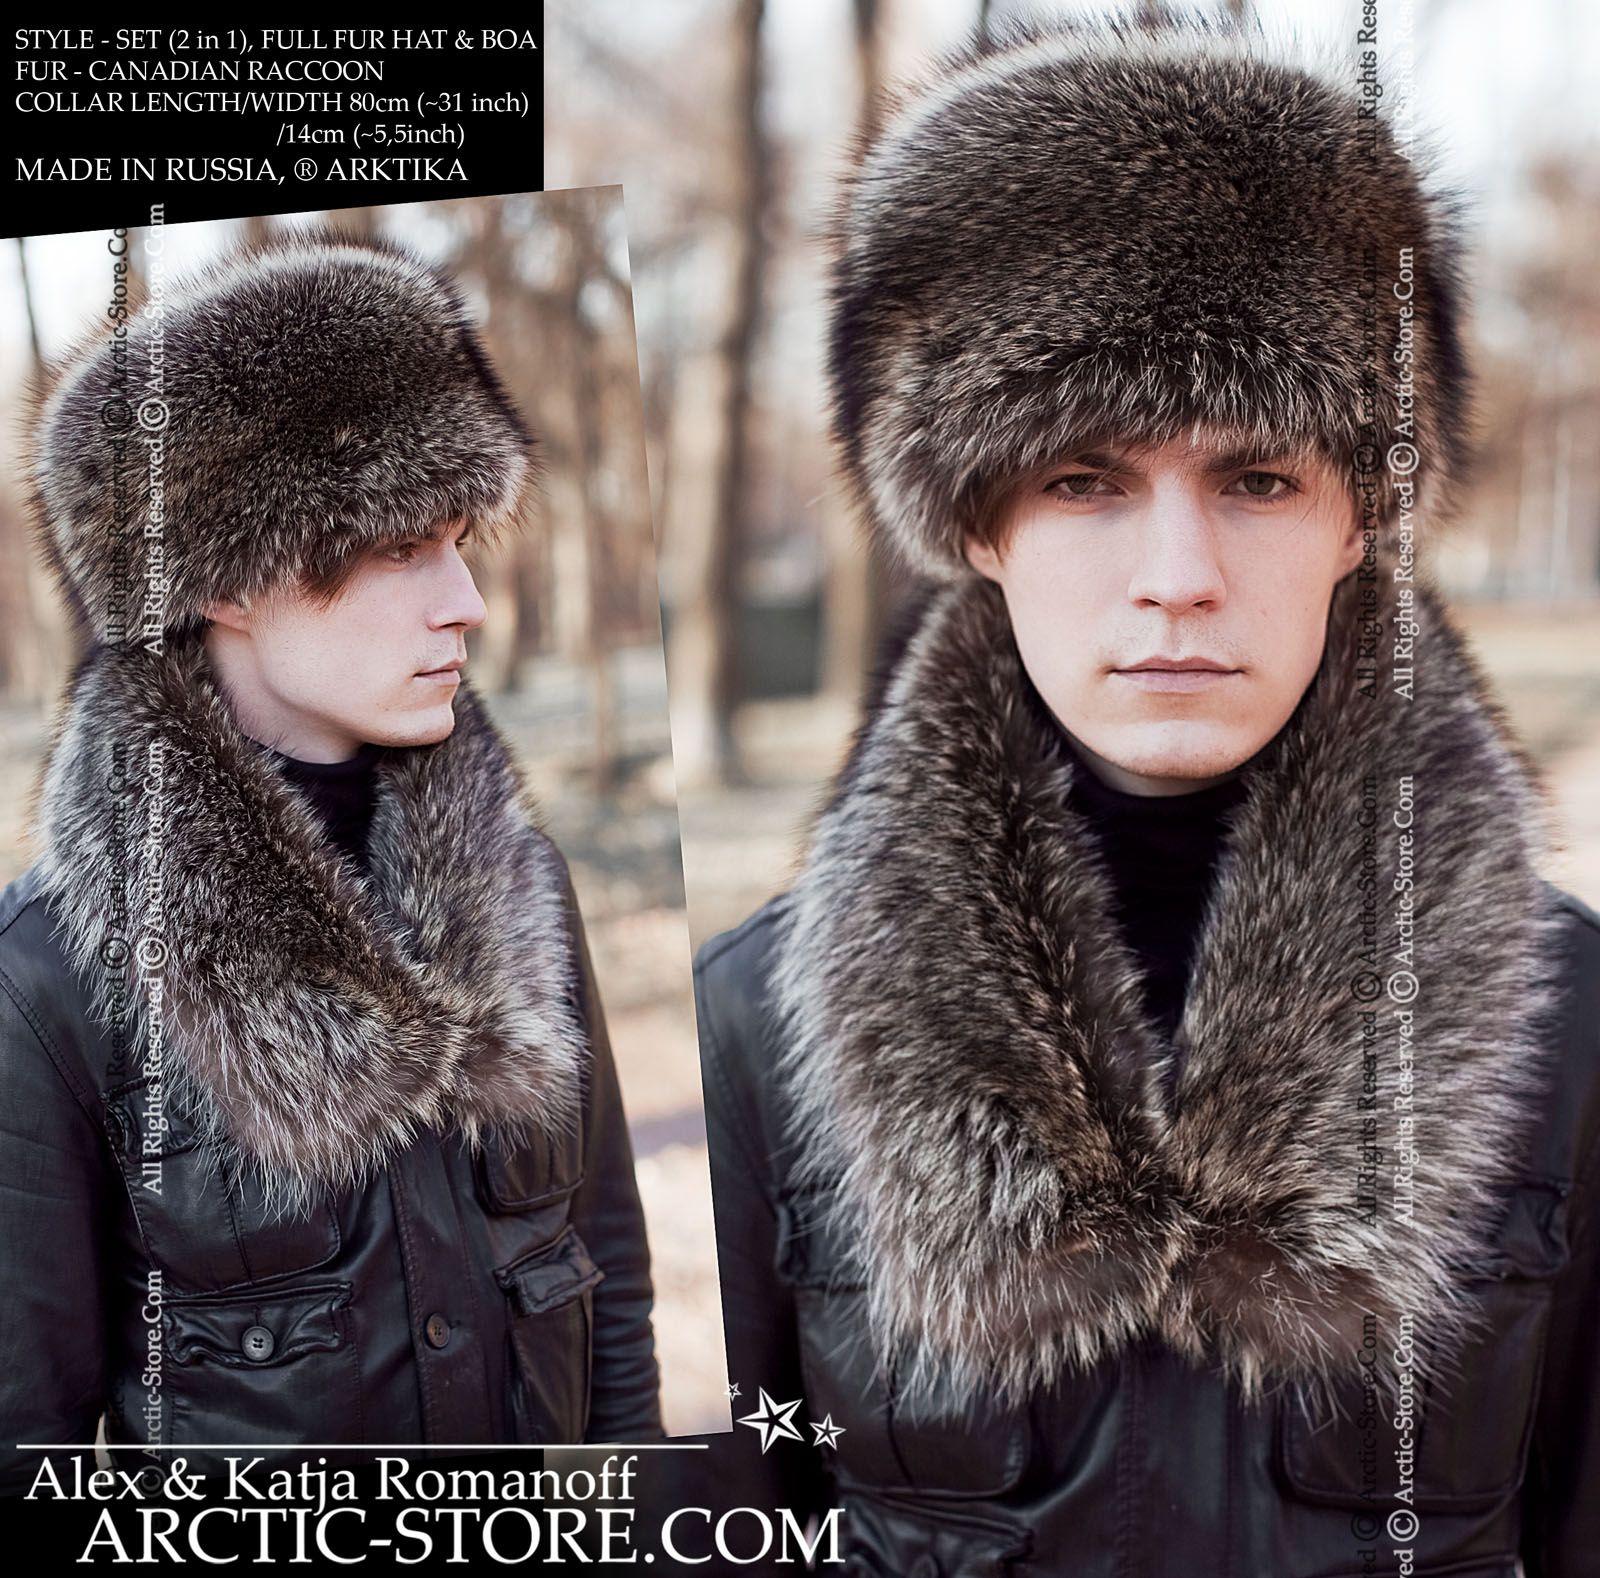 b24c0999162 Canadian raccoon set for men - men s coonskin collar and hat - arctic-store